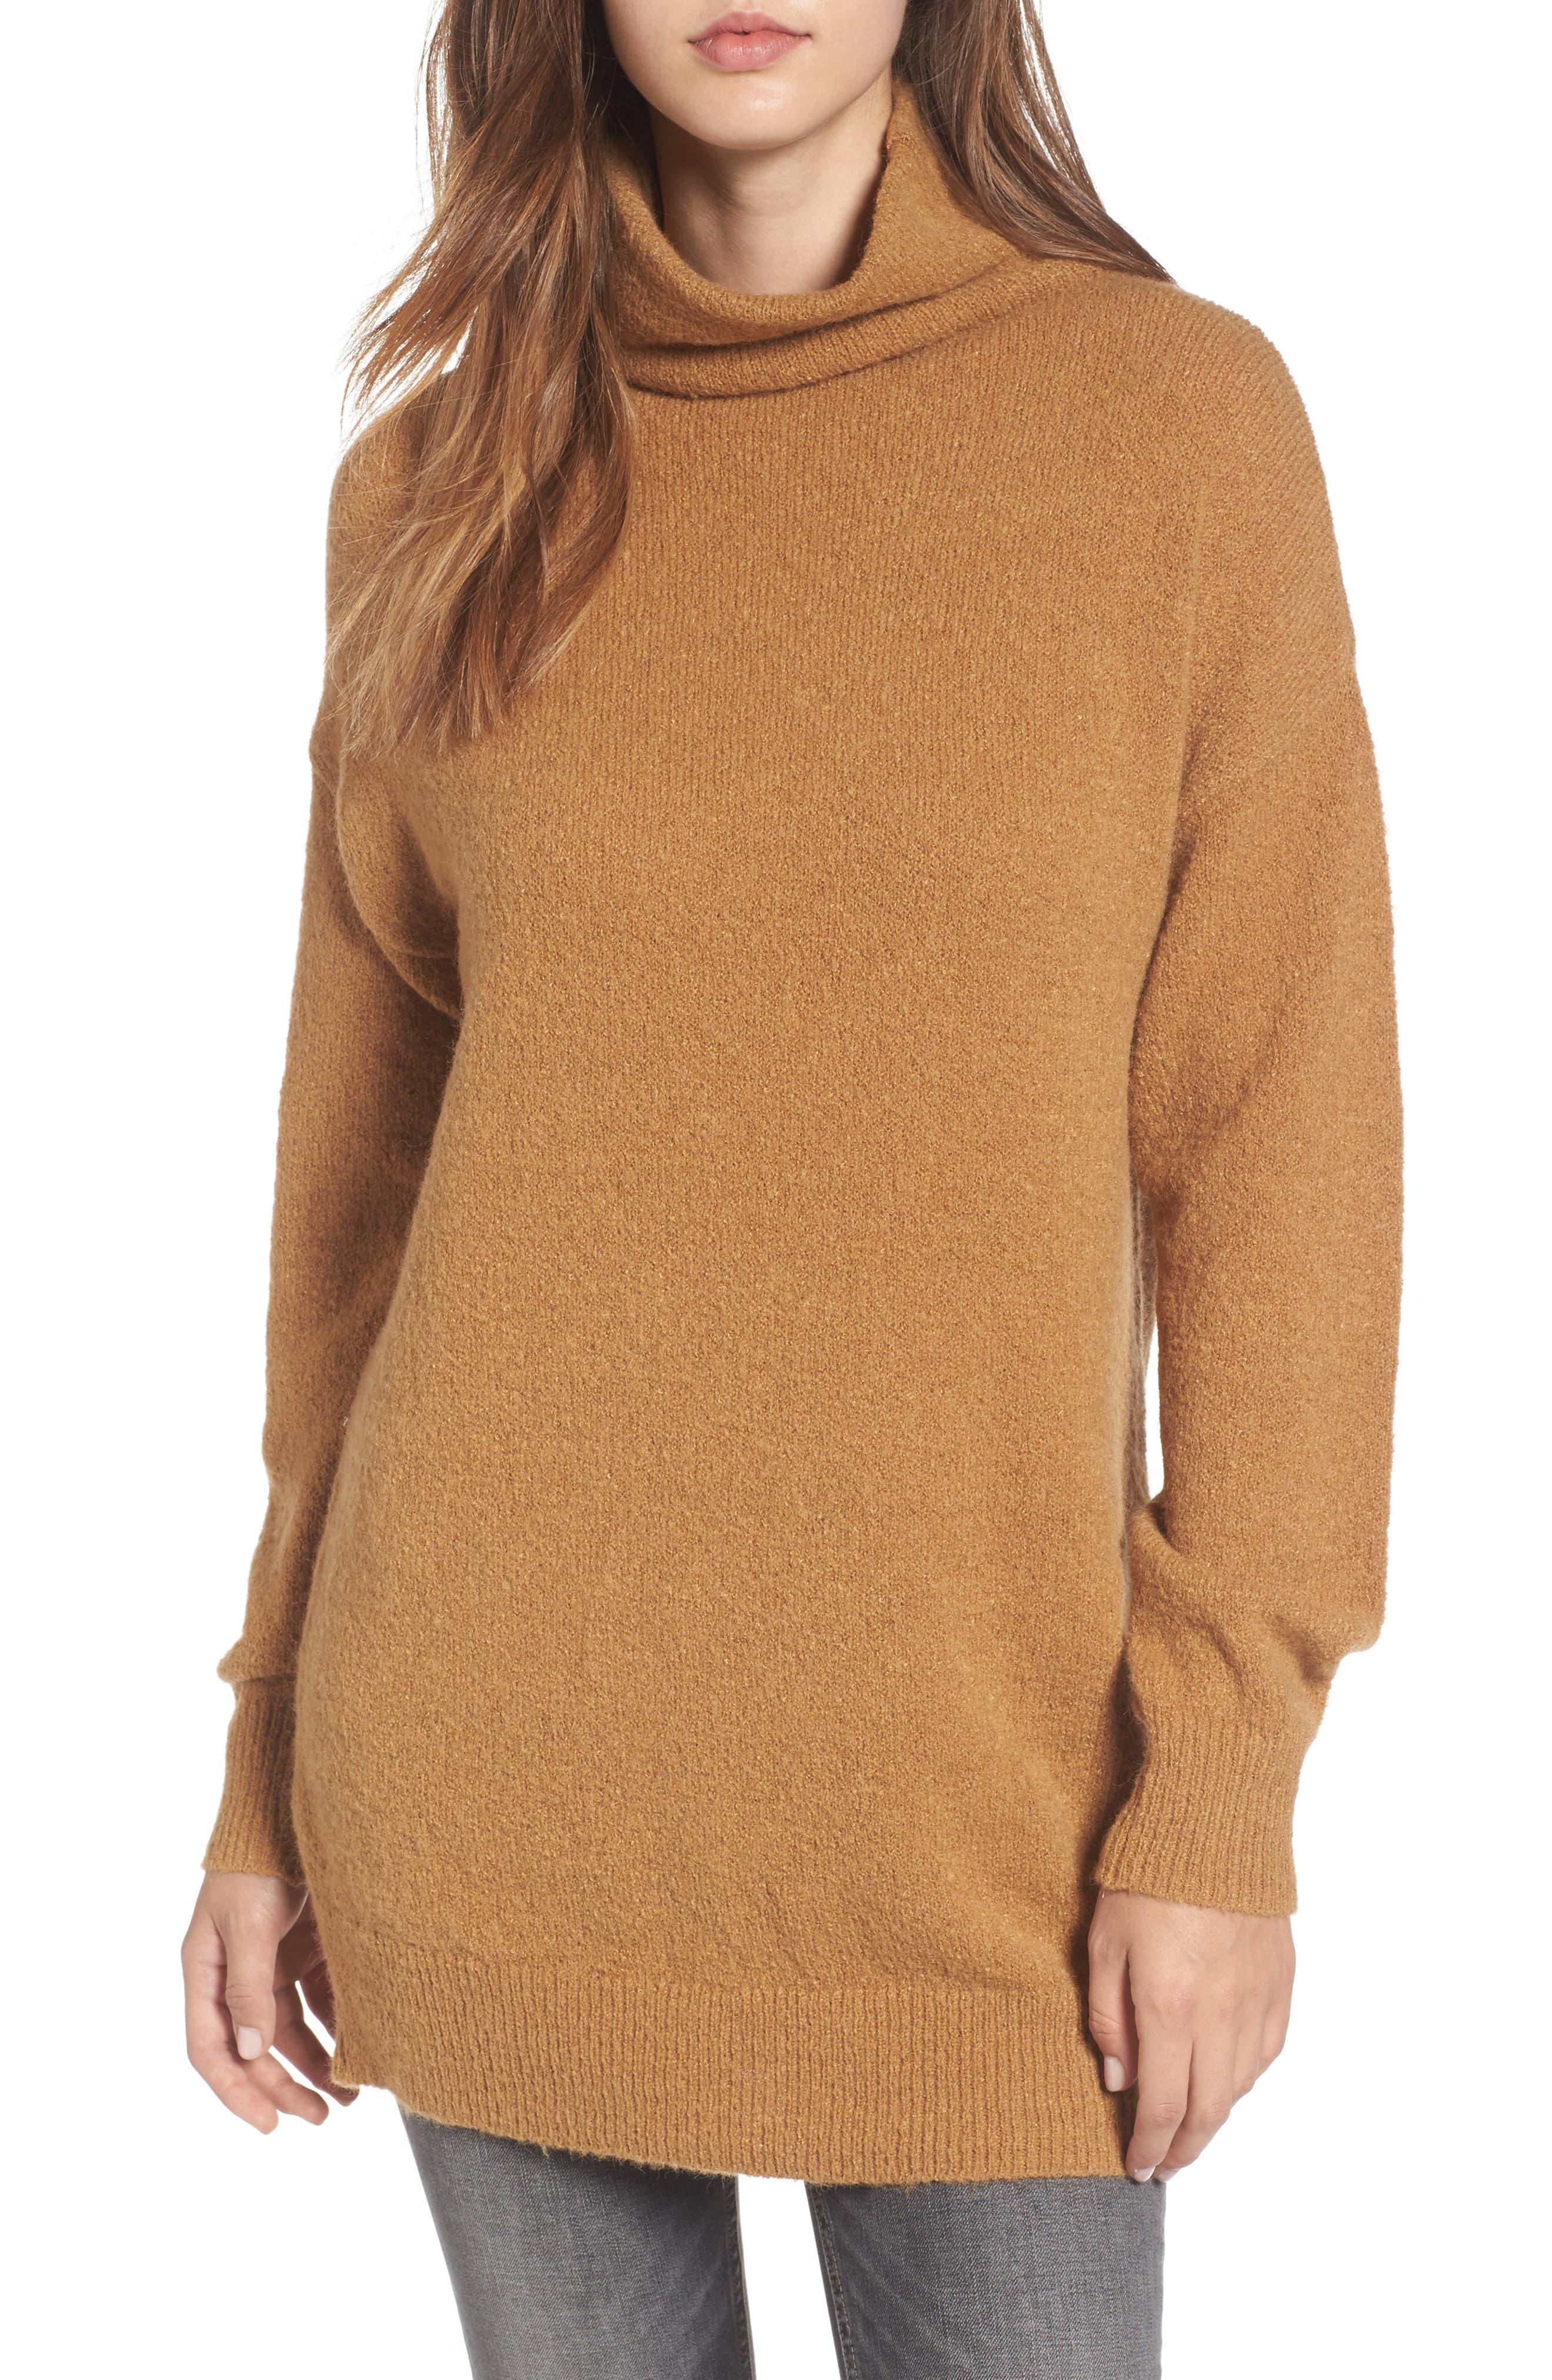 Main Image - BP. Bouclé Turtleneck Tunic Sweater